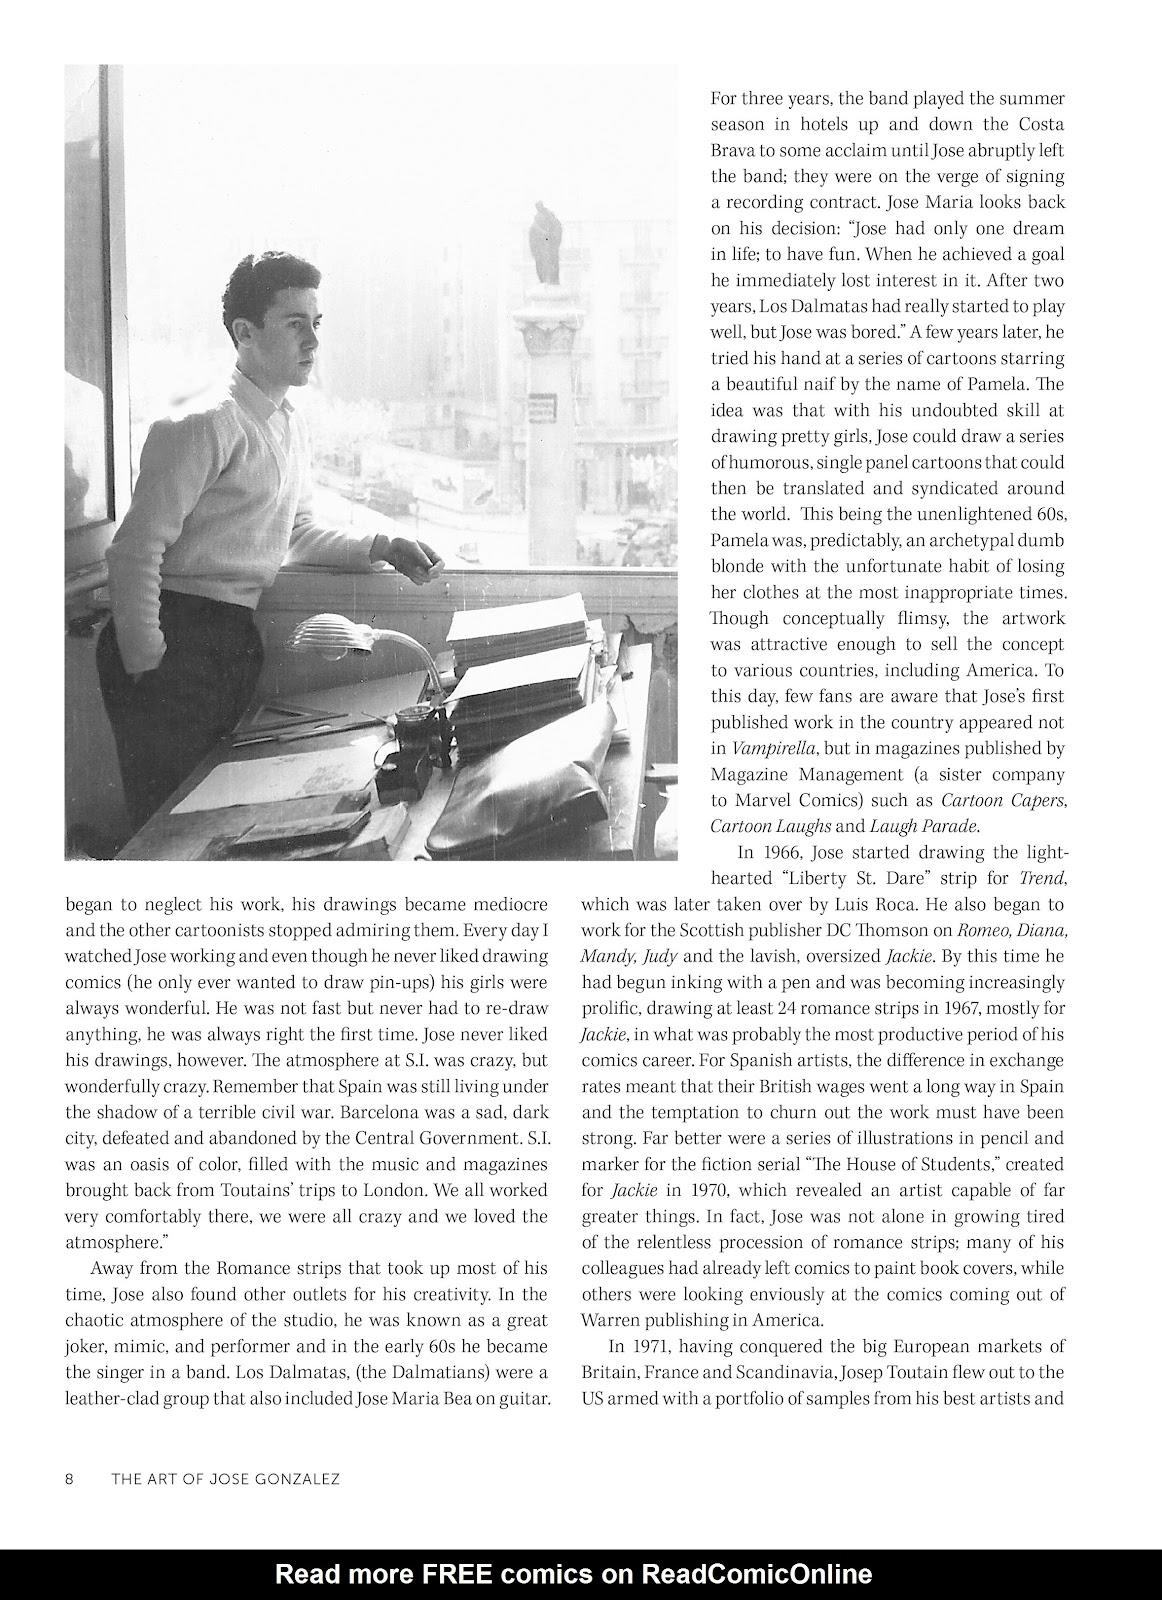 Read online The Art of Jose Gonzalez comic -  Issue # TPB (Part 1) - 9